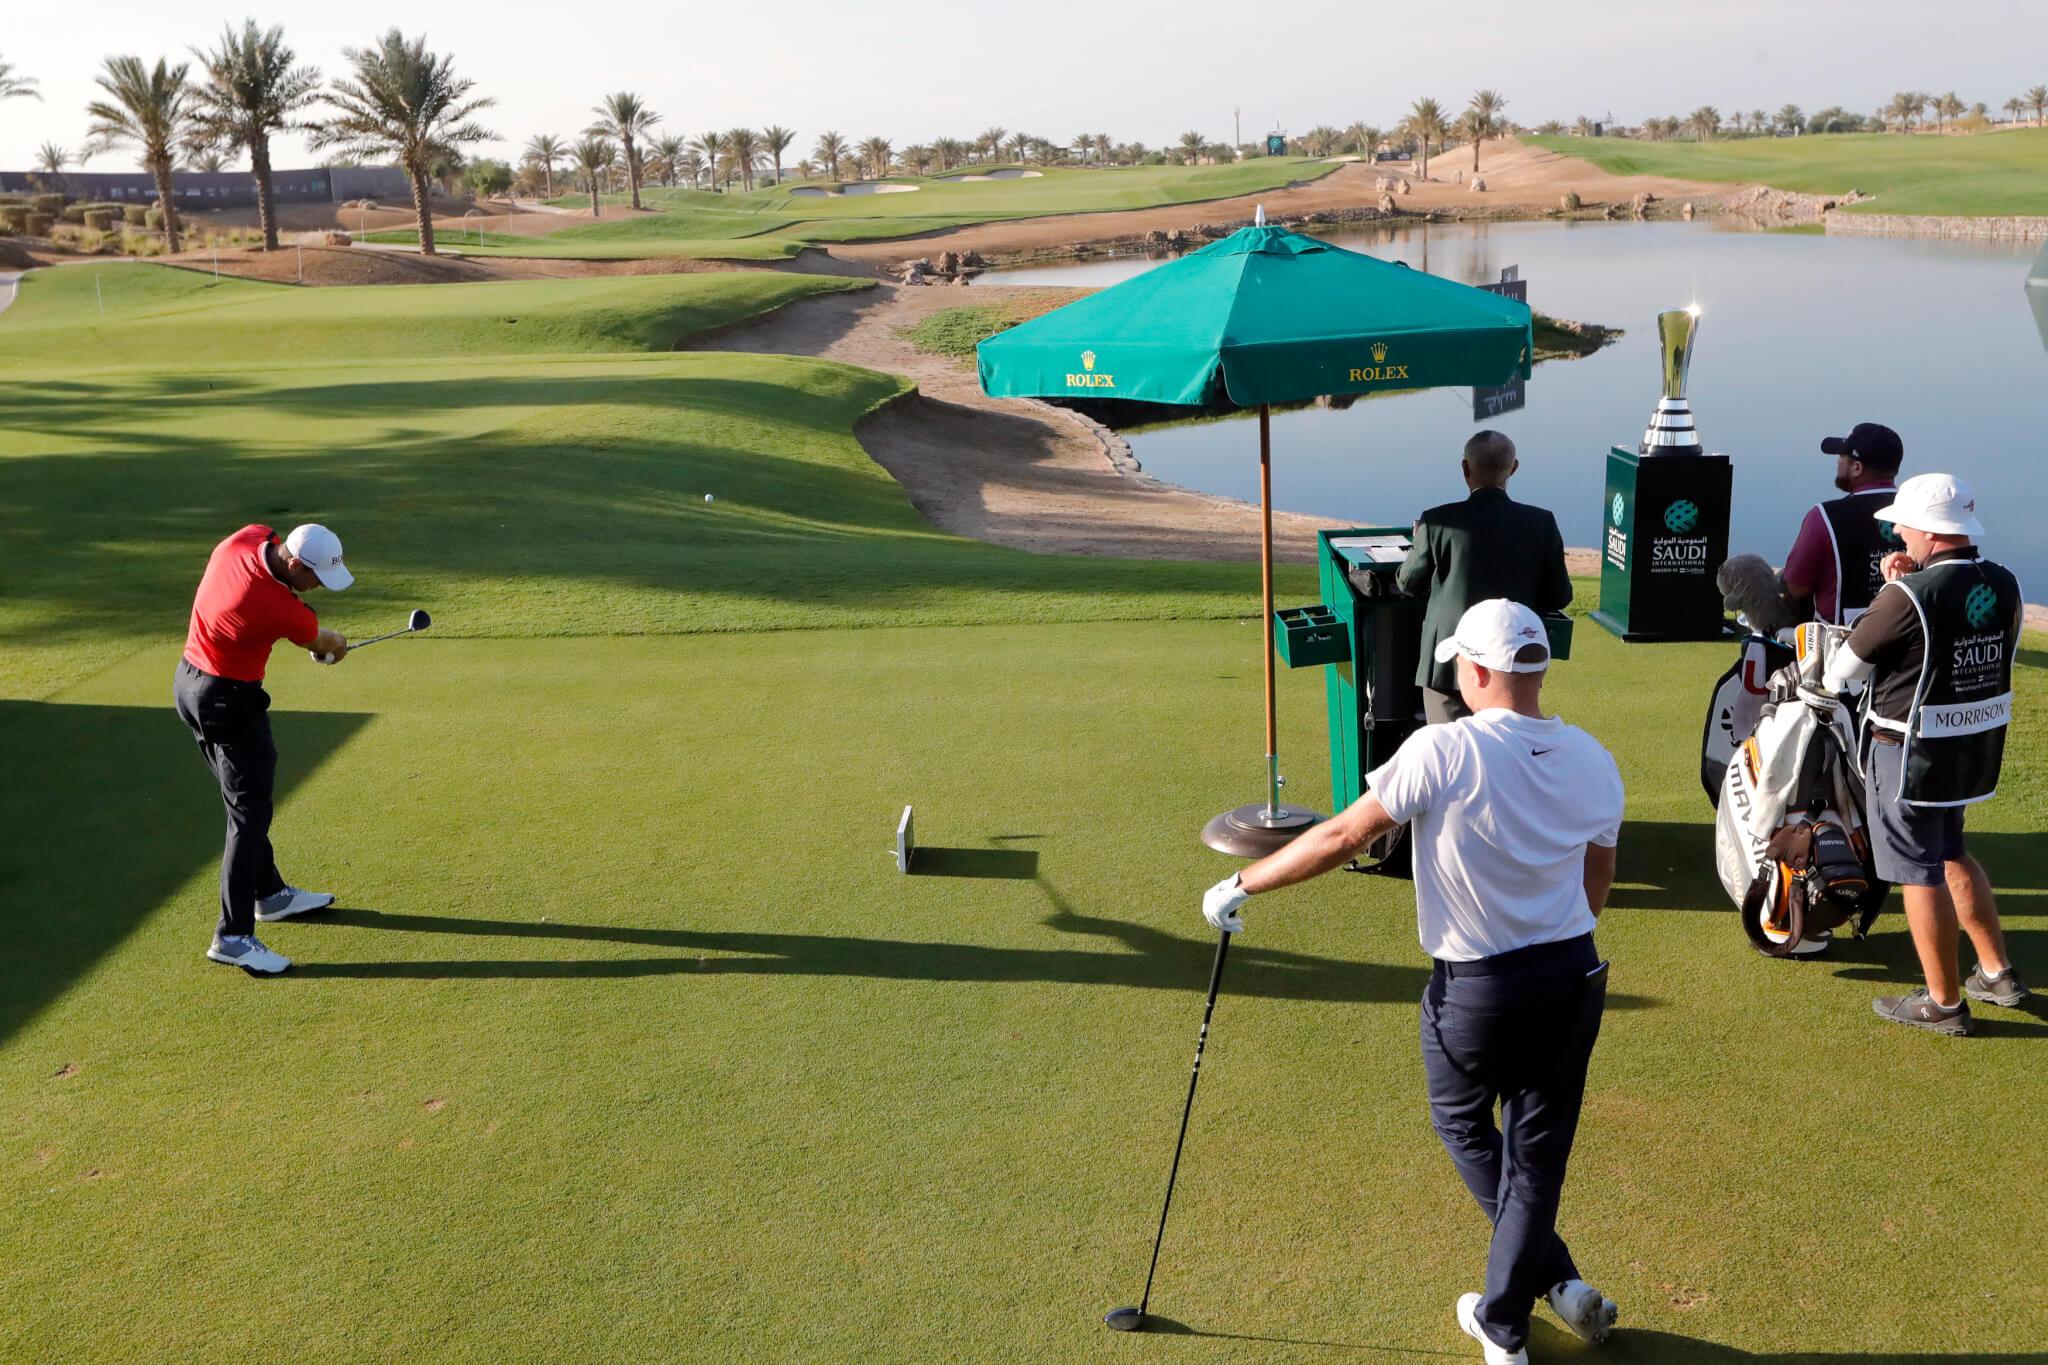 World match play golf 2021 betting sites betting window bad choice